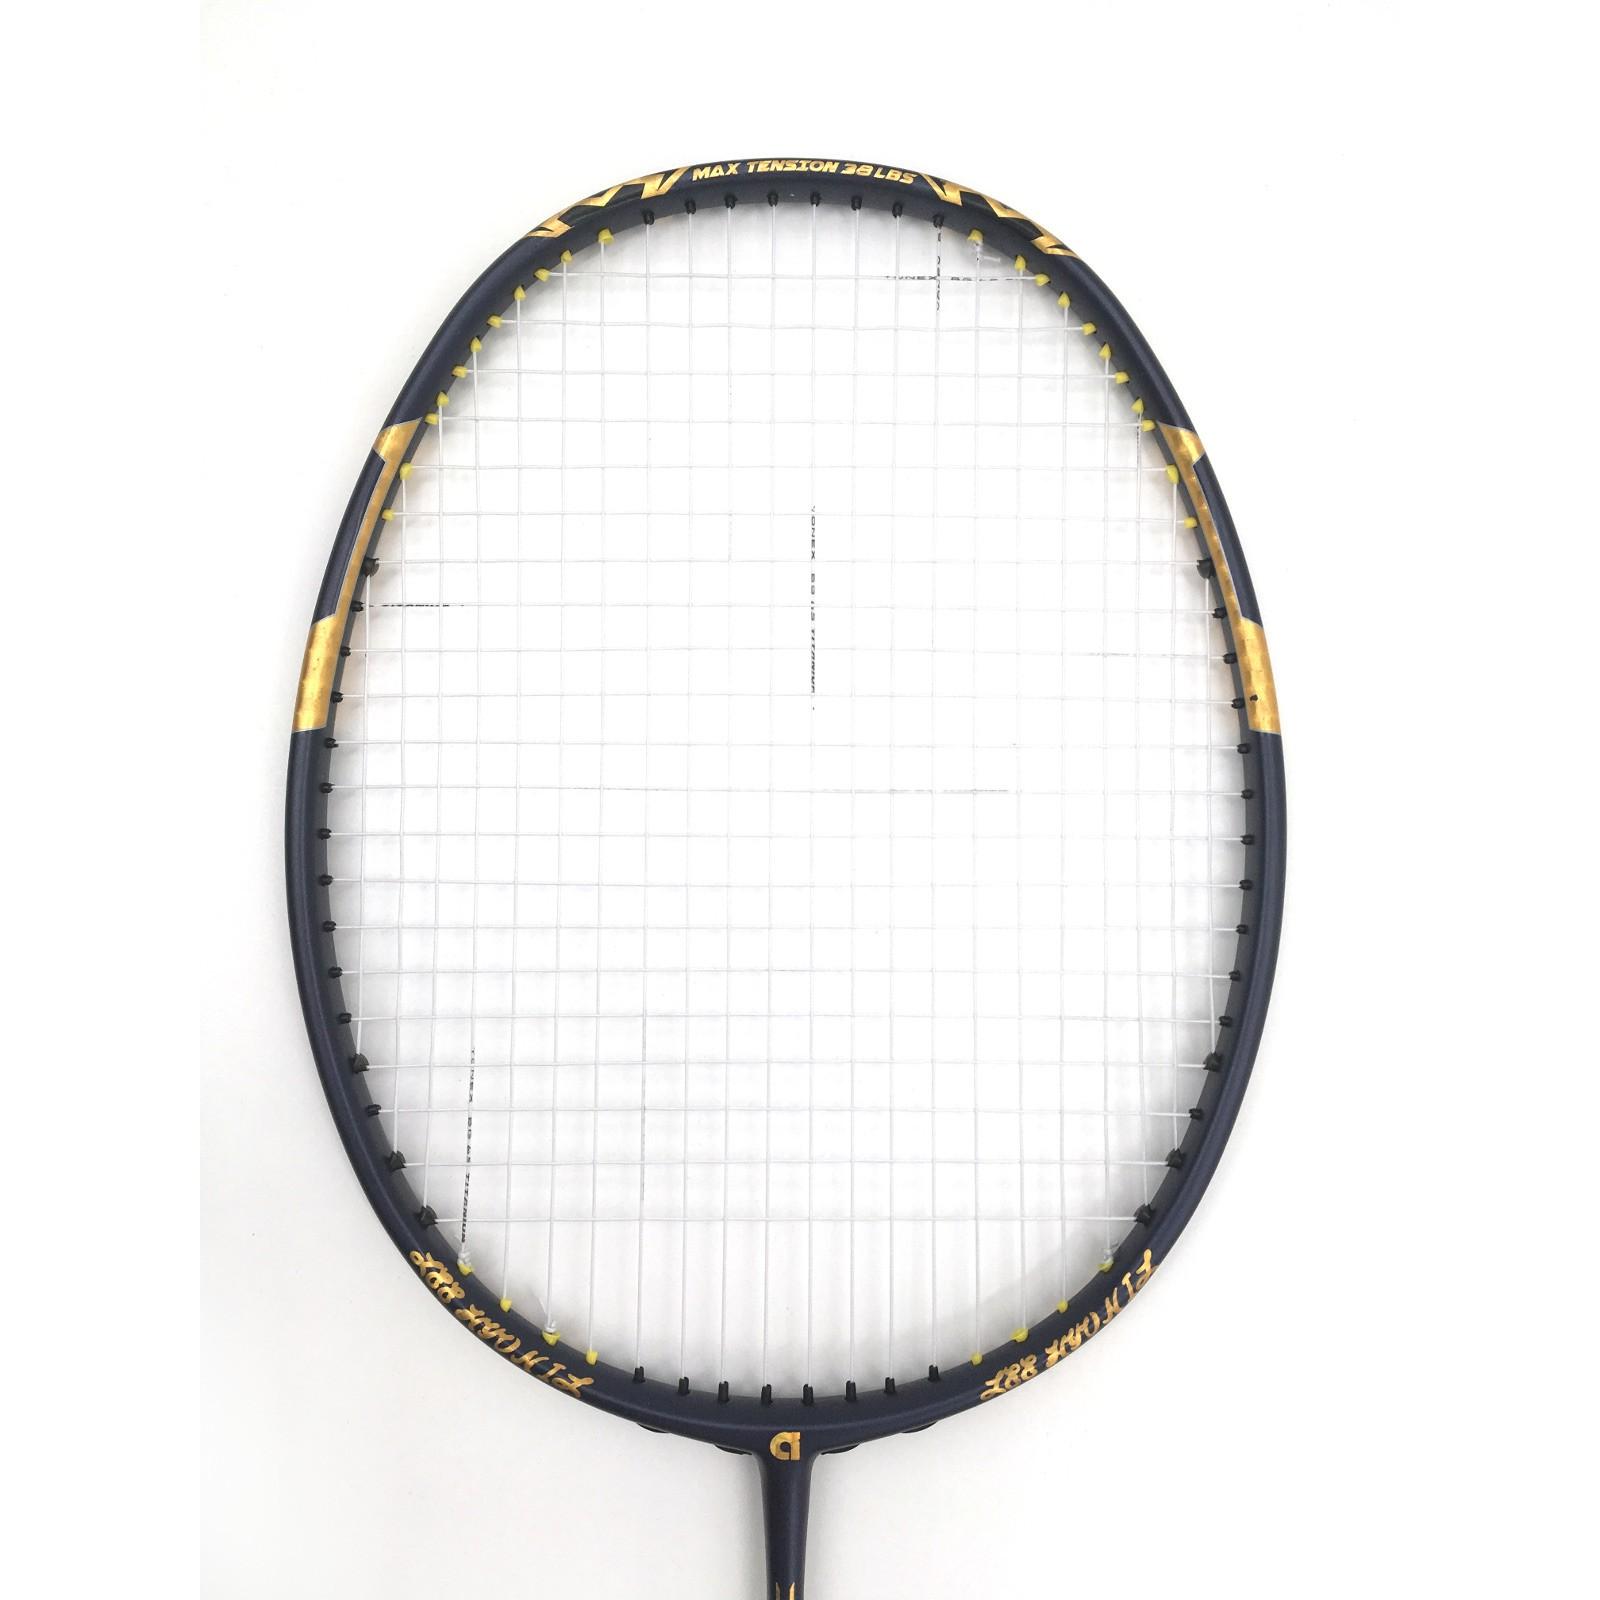 30% OFF Apacs Ziggler LHI Lee Hyun il Navy Gold Badminton Racket